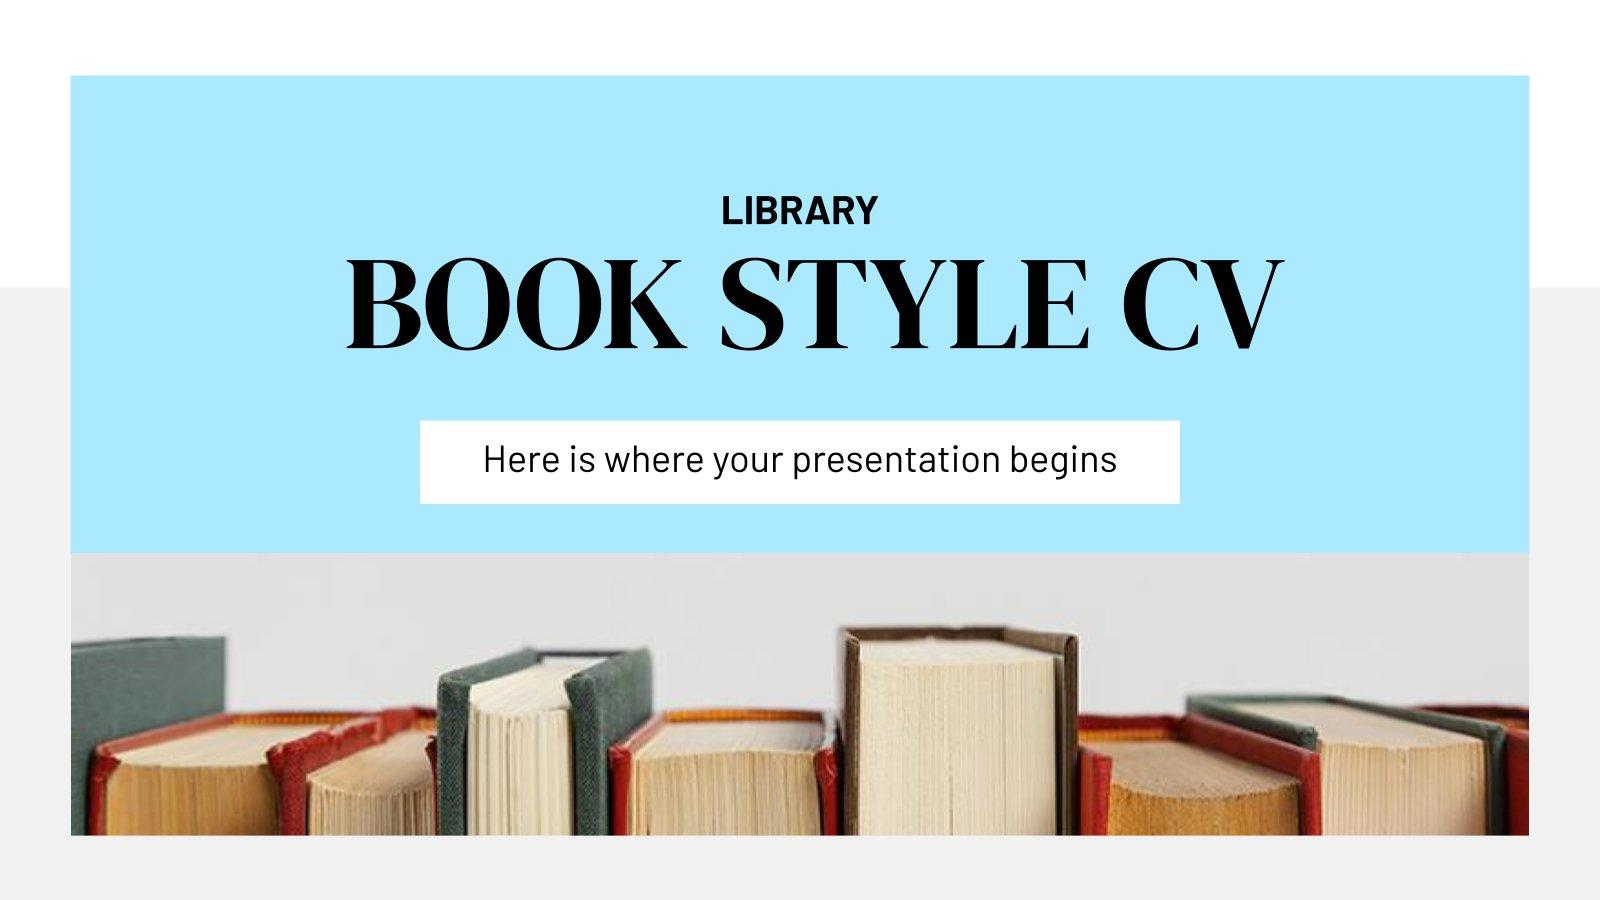 Library Book Style CV presentation template